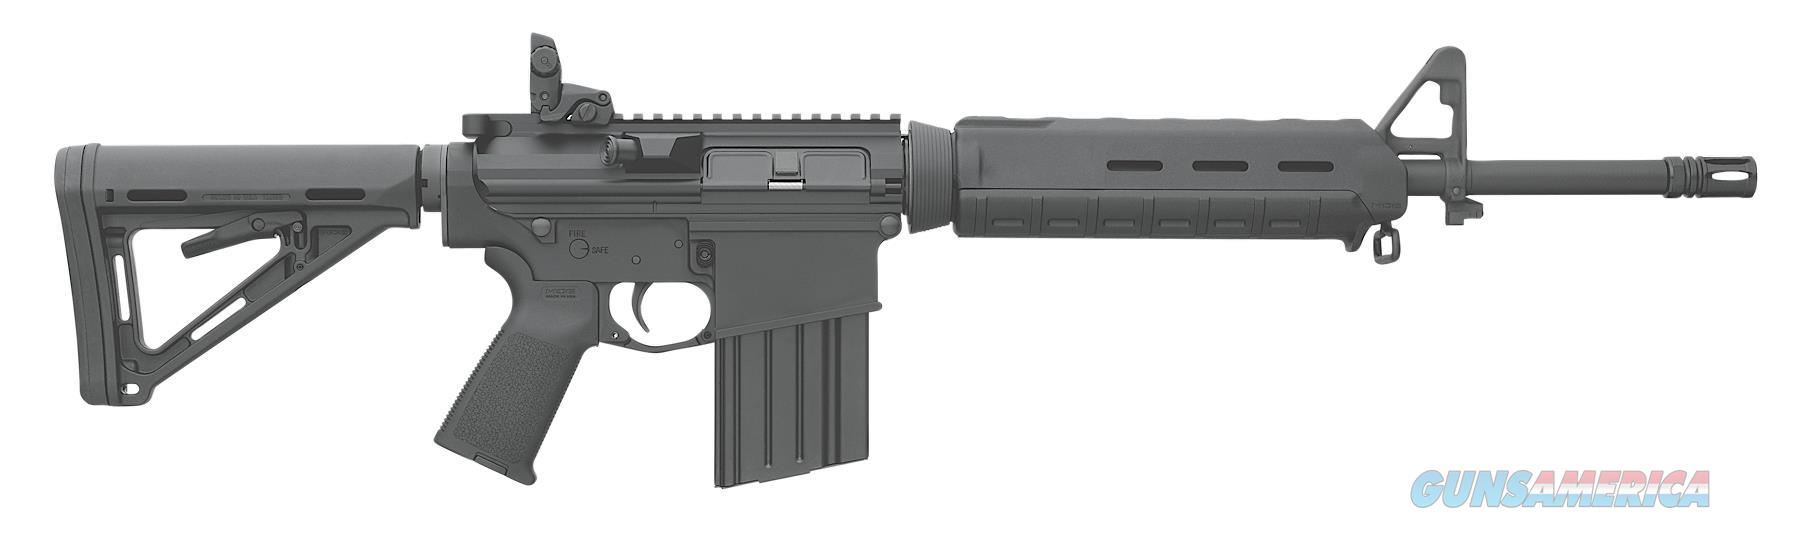 "Bushmaster 90827 Xm-15 Moe Mid-Length Semi-Automatic 223 Remington/5.56 Nato 16"" 30+1 Magpul Moe Black Stk Black 90827  Guns > Rifles > B Misc Rifles"